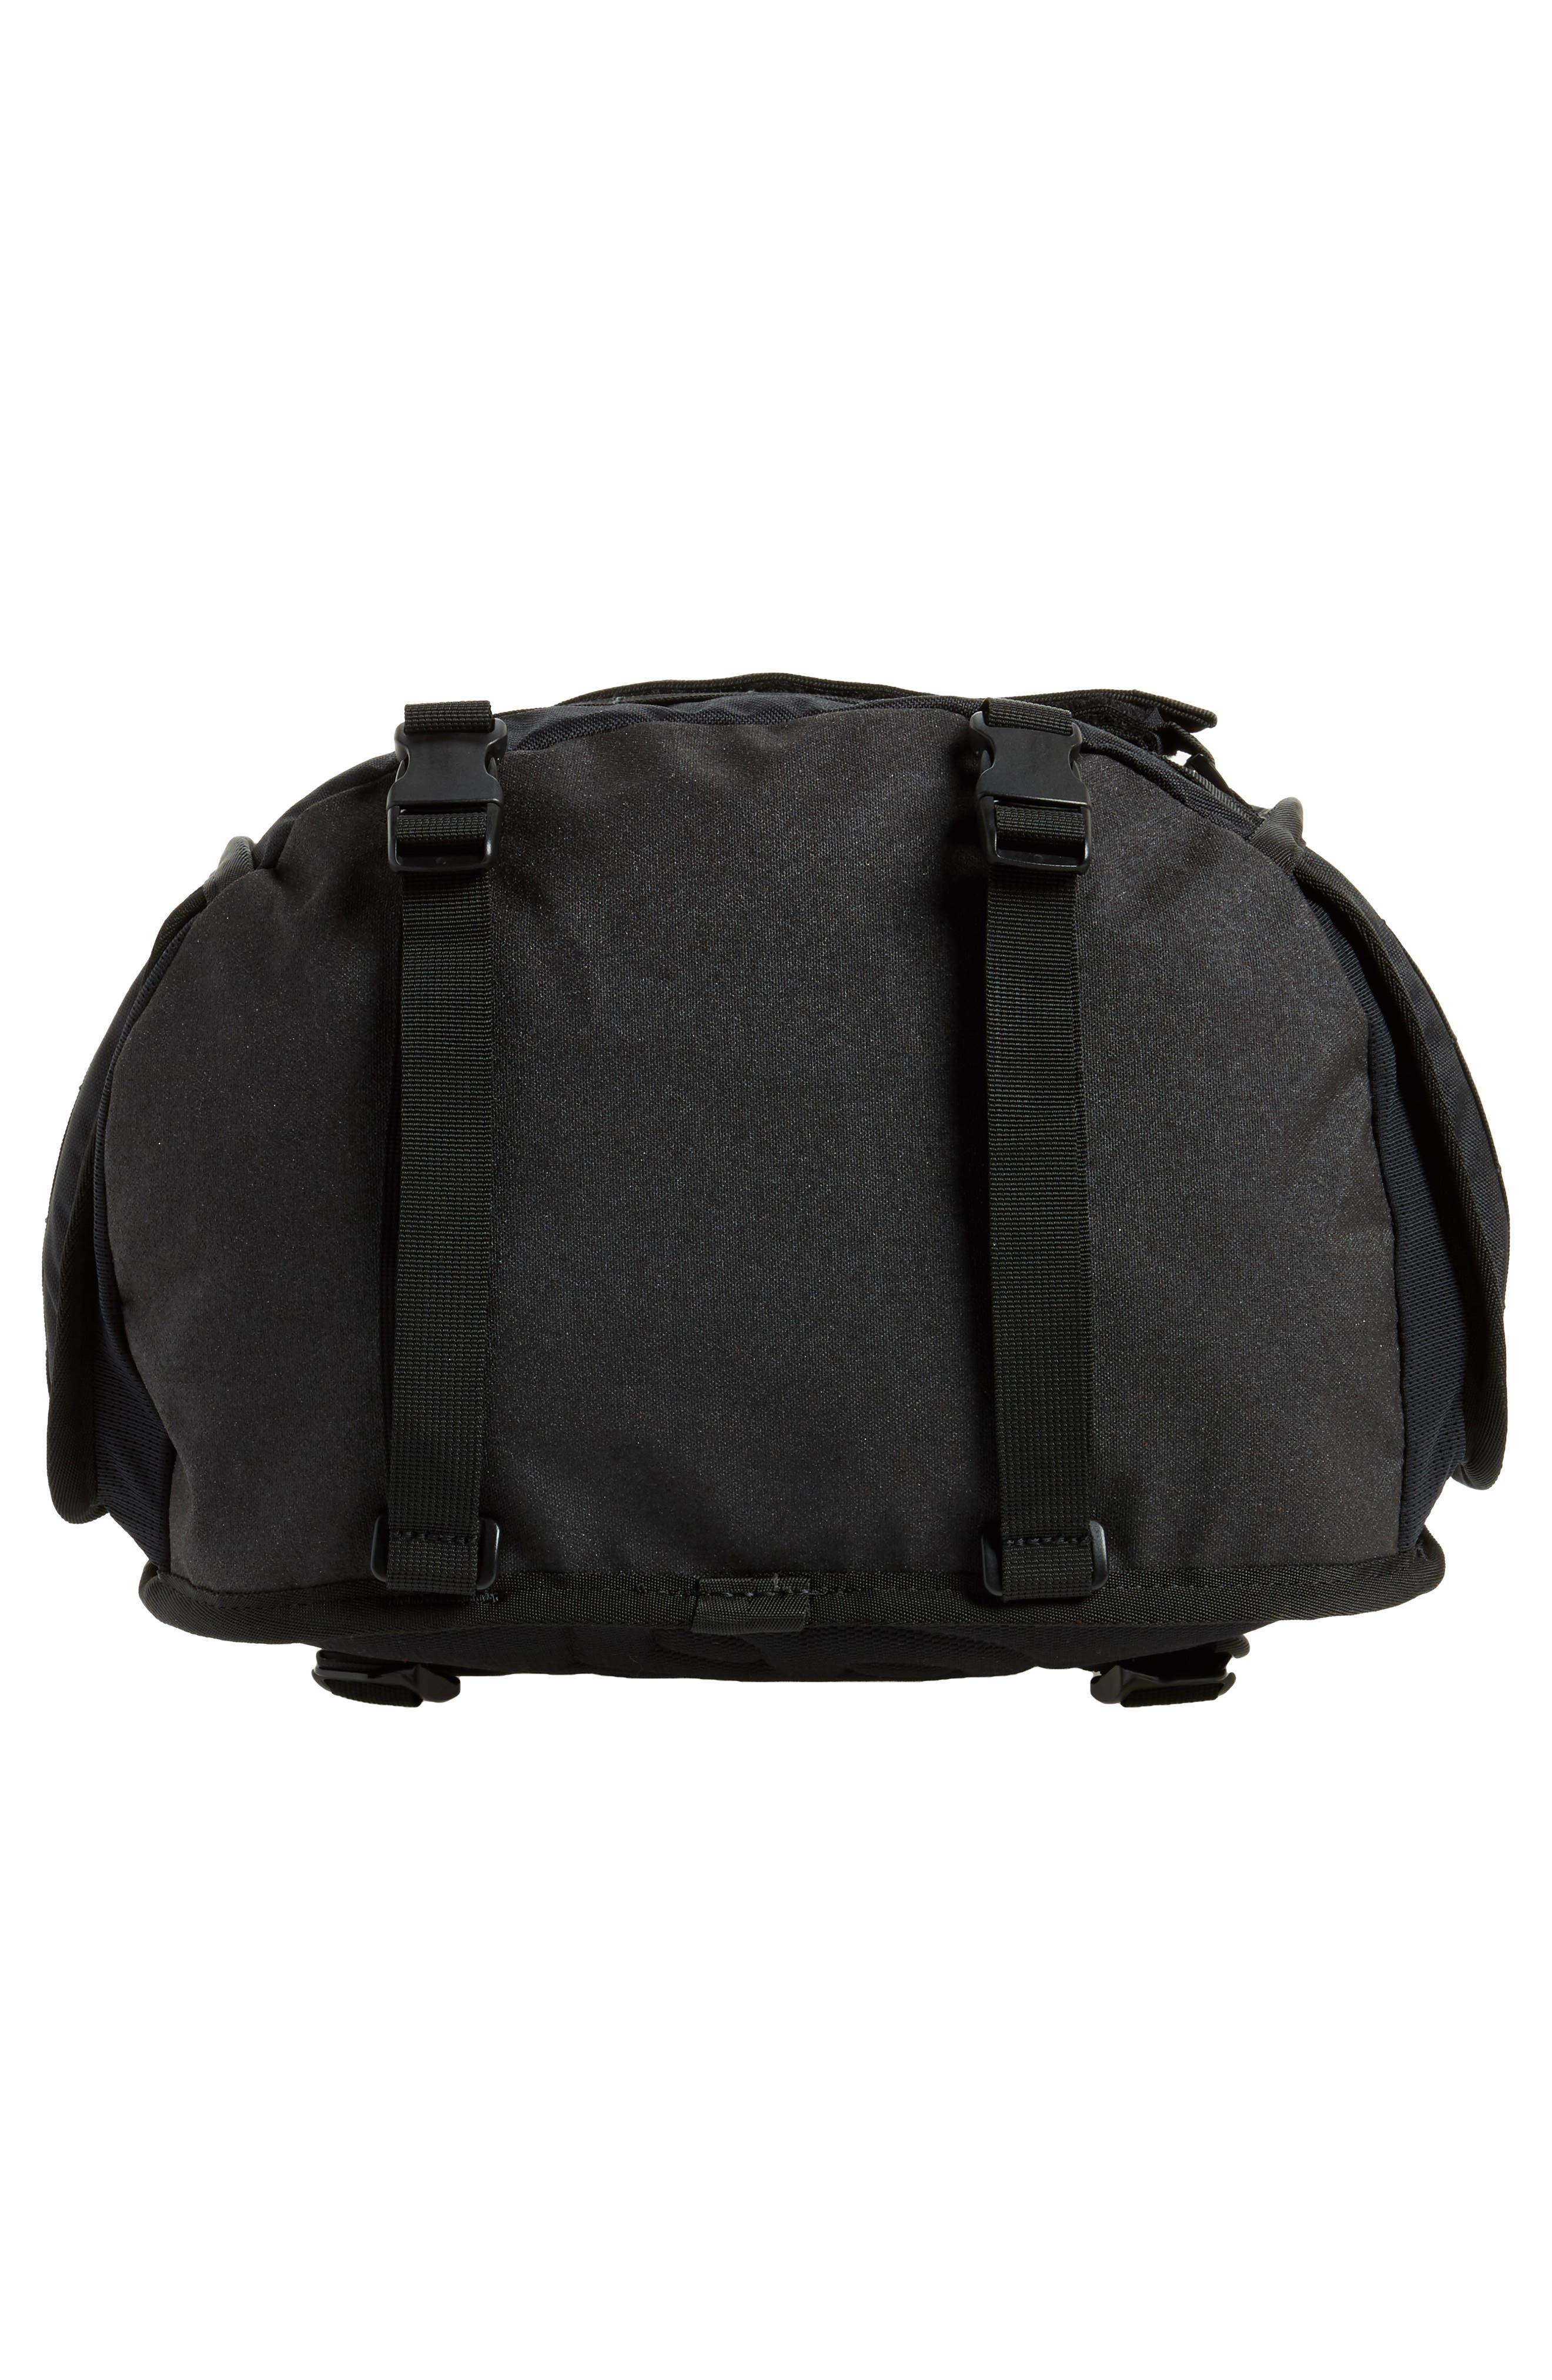 RPM Backpack,                             Alternate thumbnail 6, color,                             BLACK/ BLACK/ BLACK